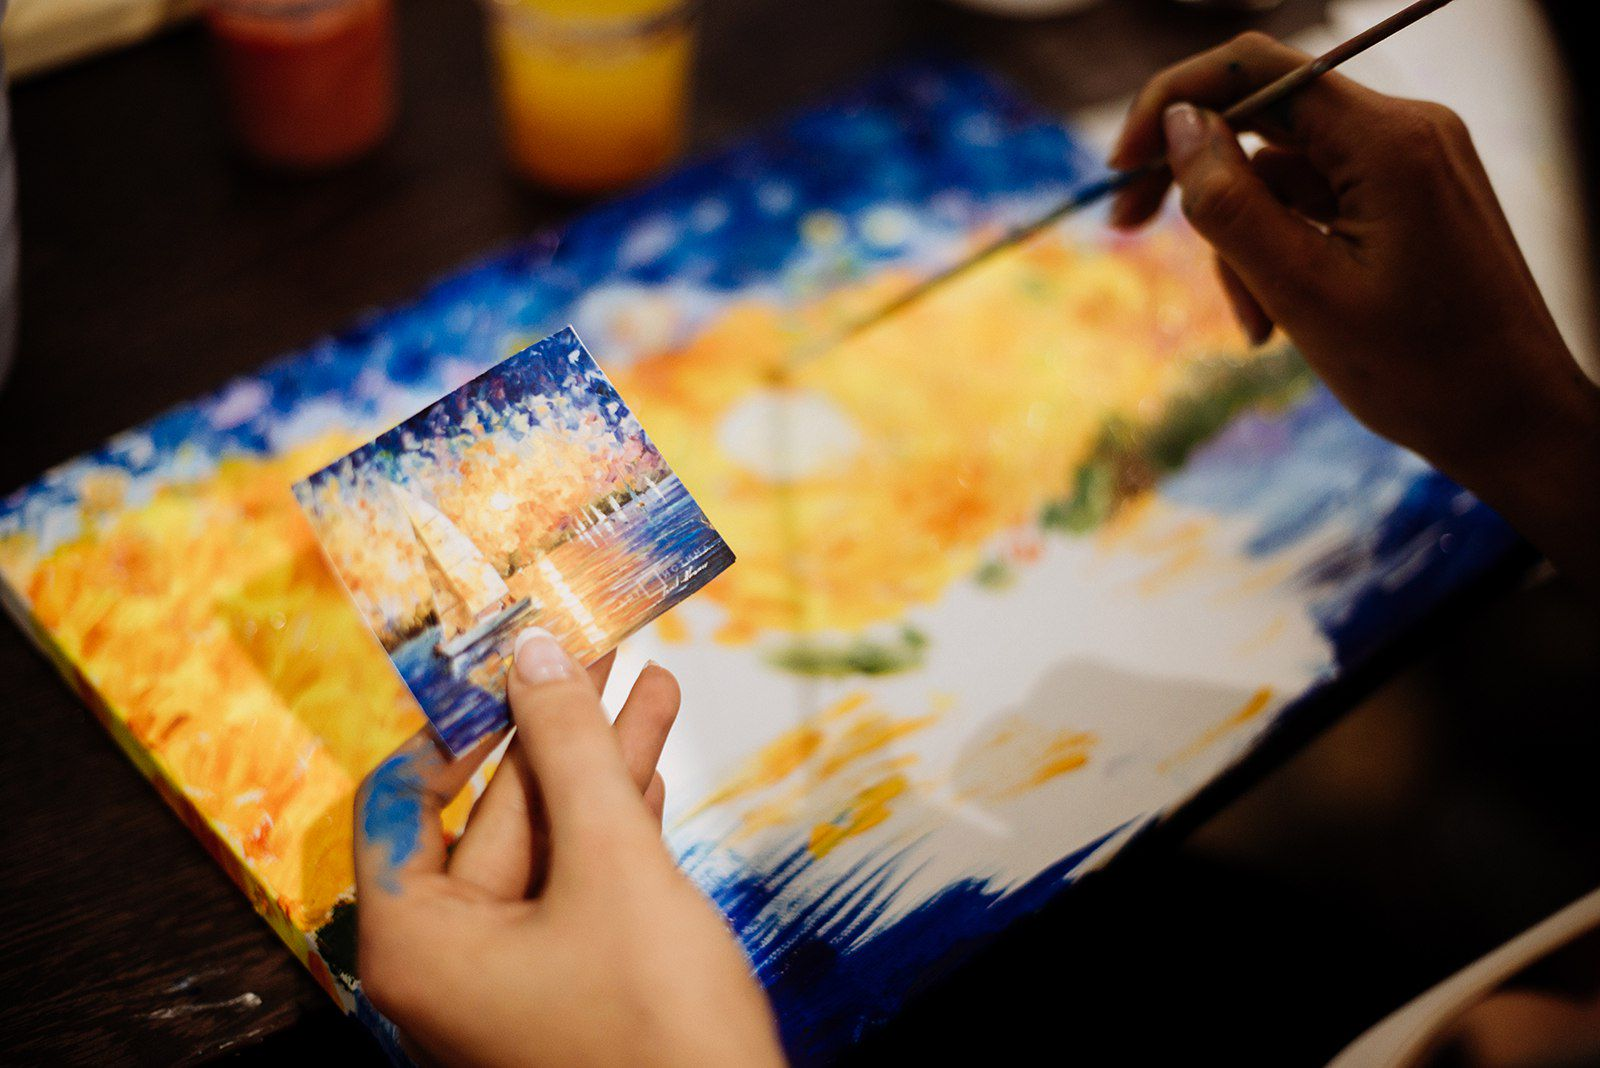 Мастер-класс «Картина за 3 часа» в студии живописи ZuART фото 3